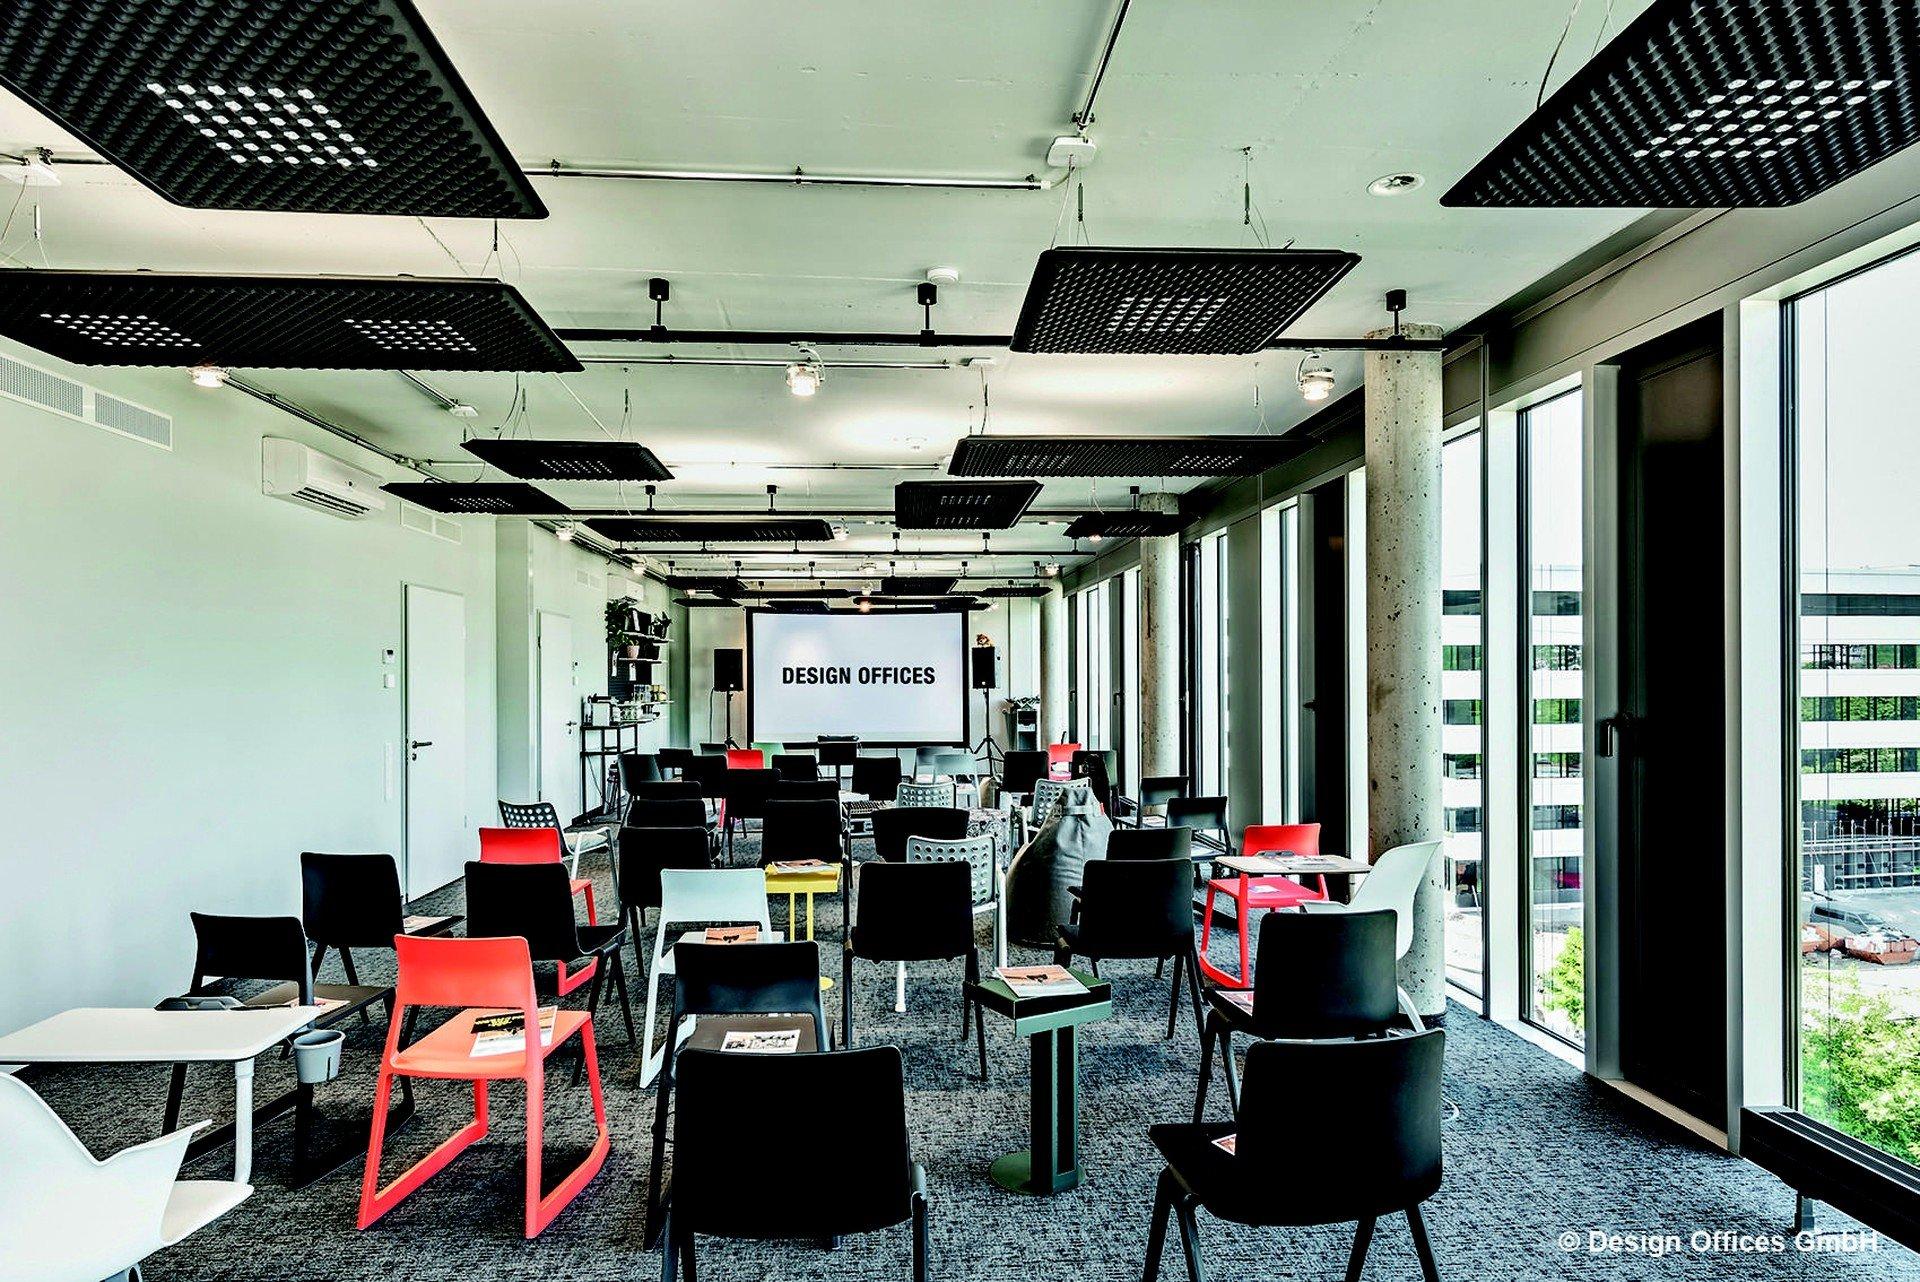 Mannheim Schulungsräume Salle de réunion Design Offices Heidelberg Colours Training Room I image 0